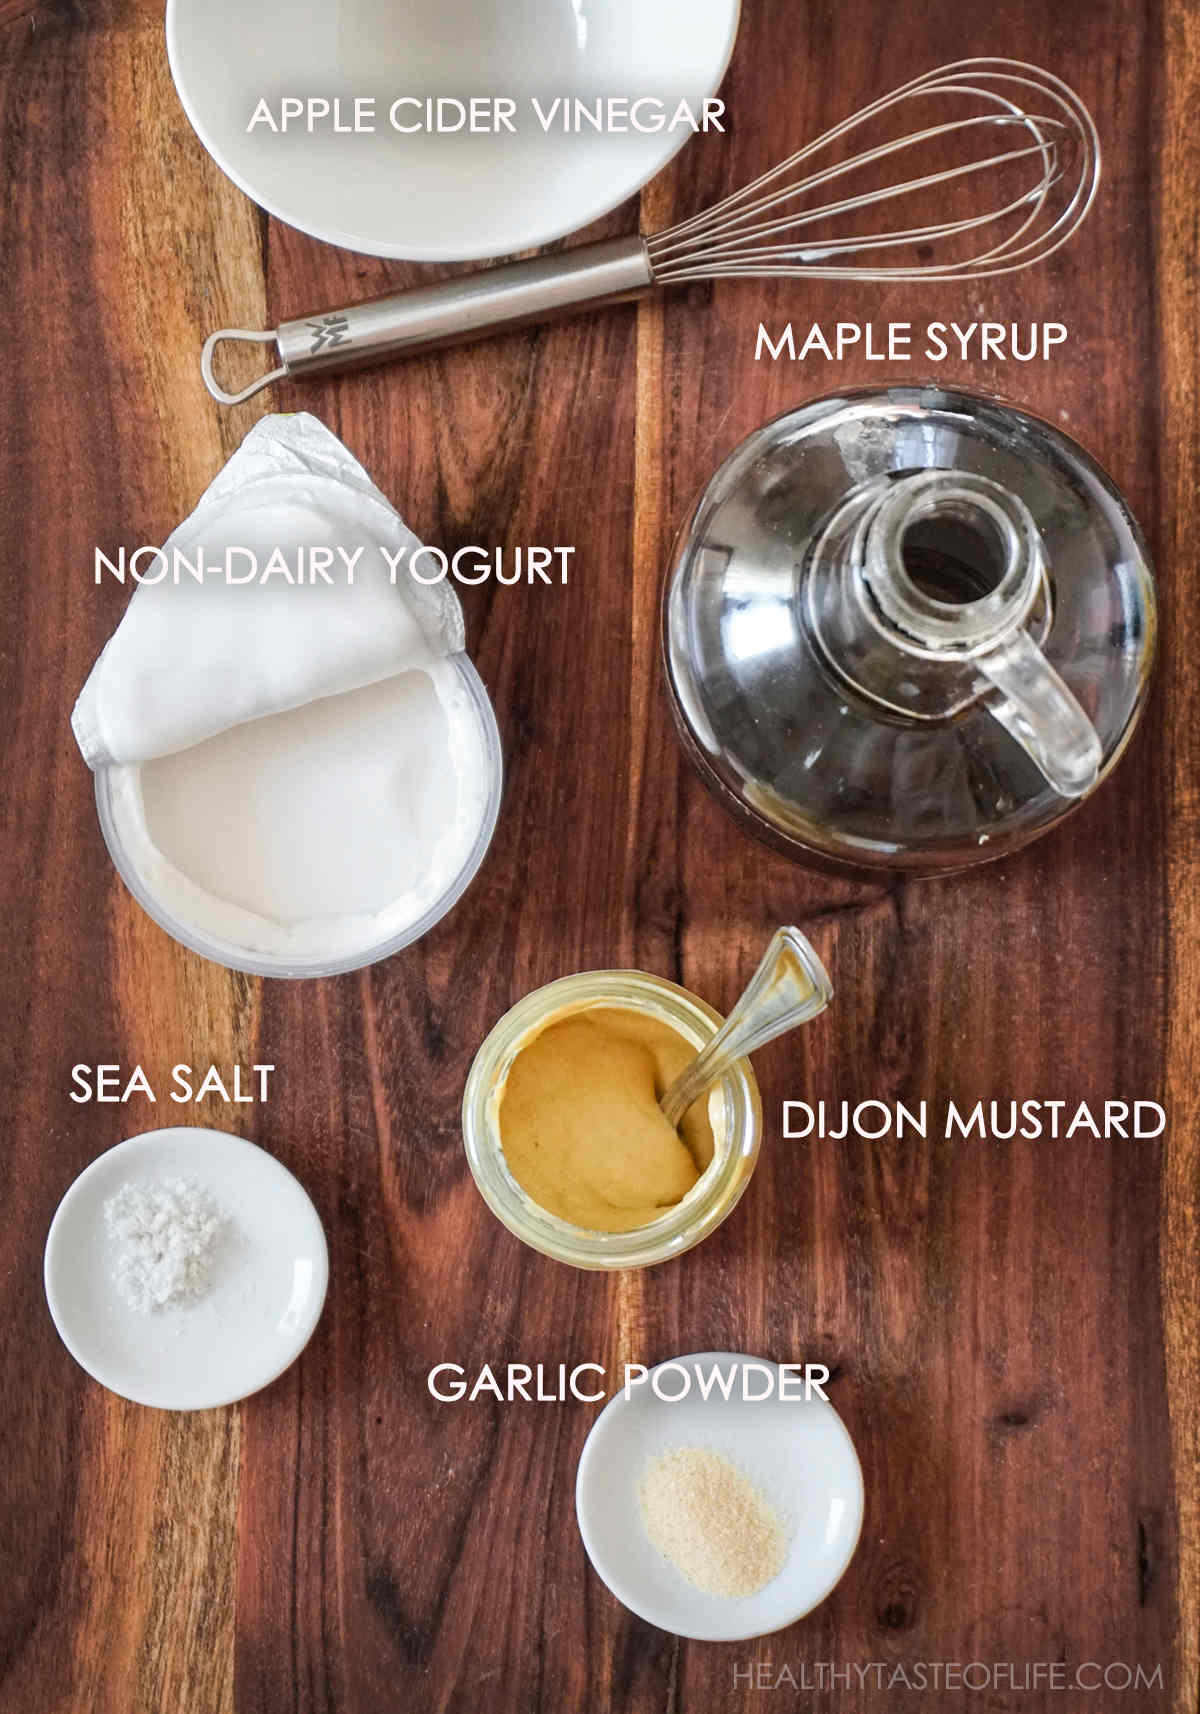 Ingredients for vegan honey mustard dressing displayed on a board: Dijon mustard, maple syrup, dairy free yogurt, apple cider vinegar garlic powder, sea salt.